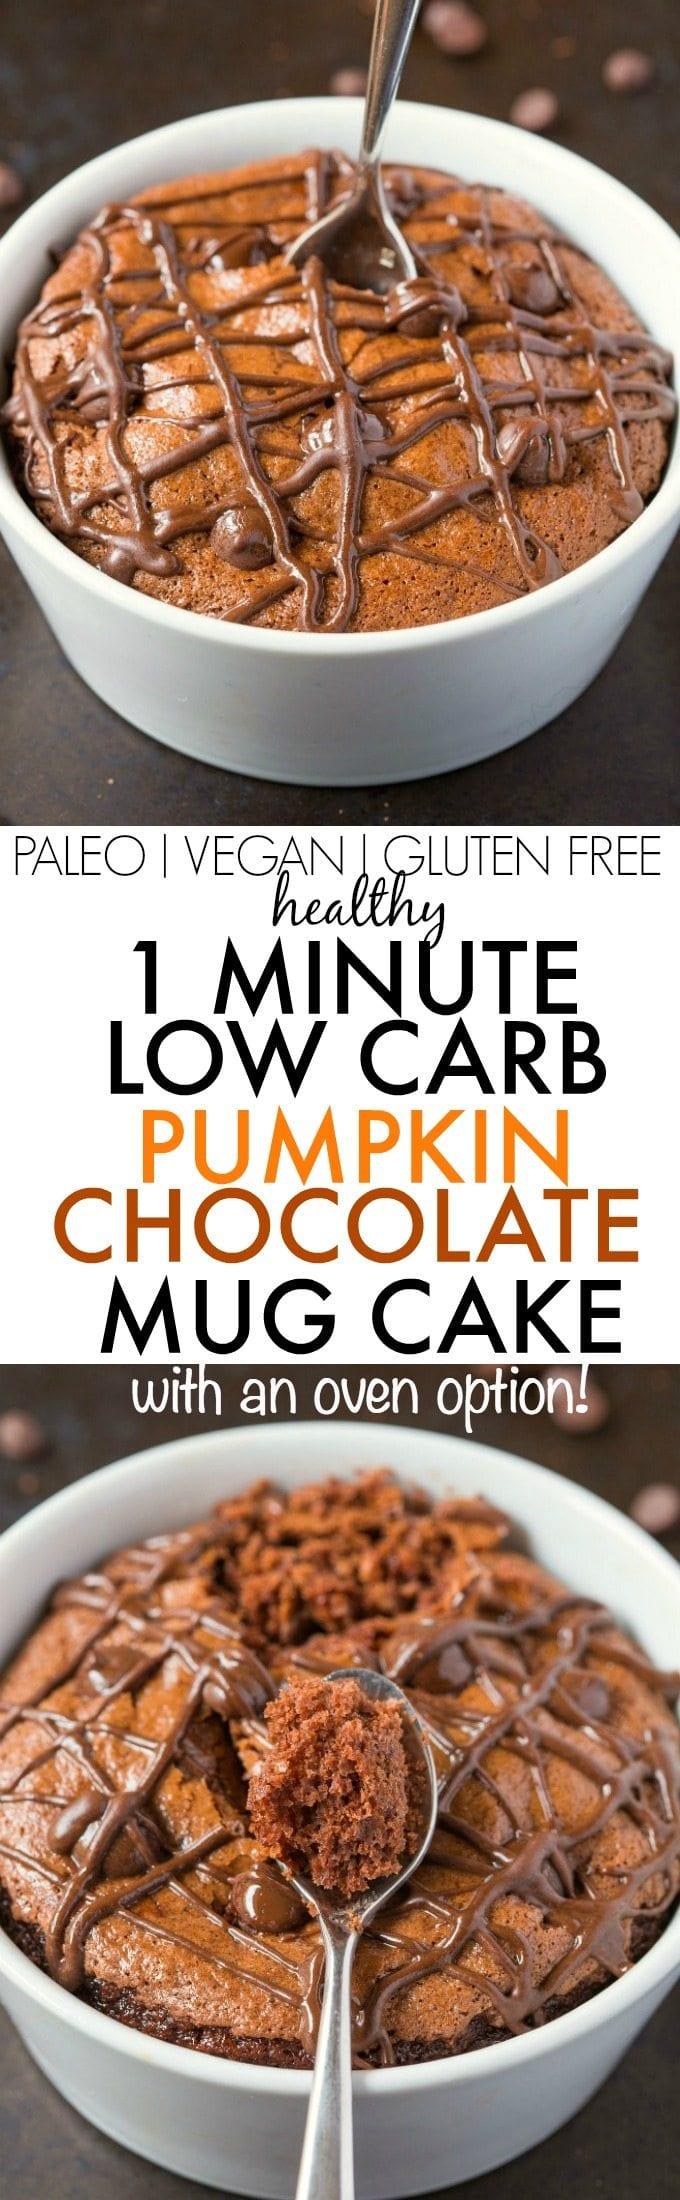 Gluten Free Egg Free Mug Cake